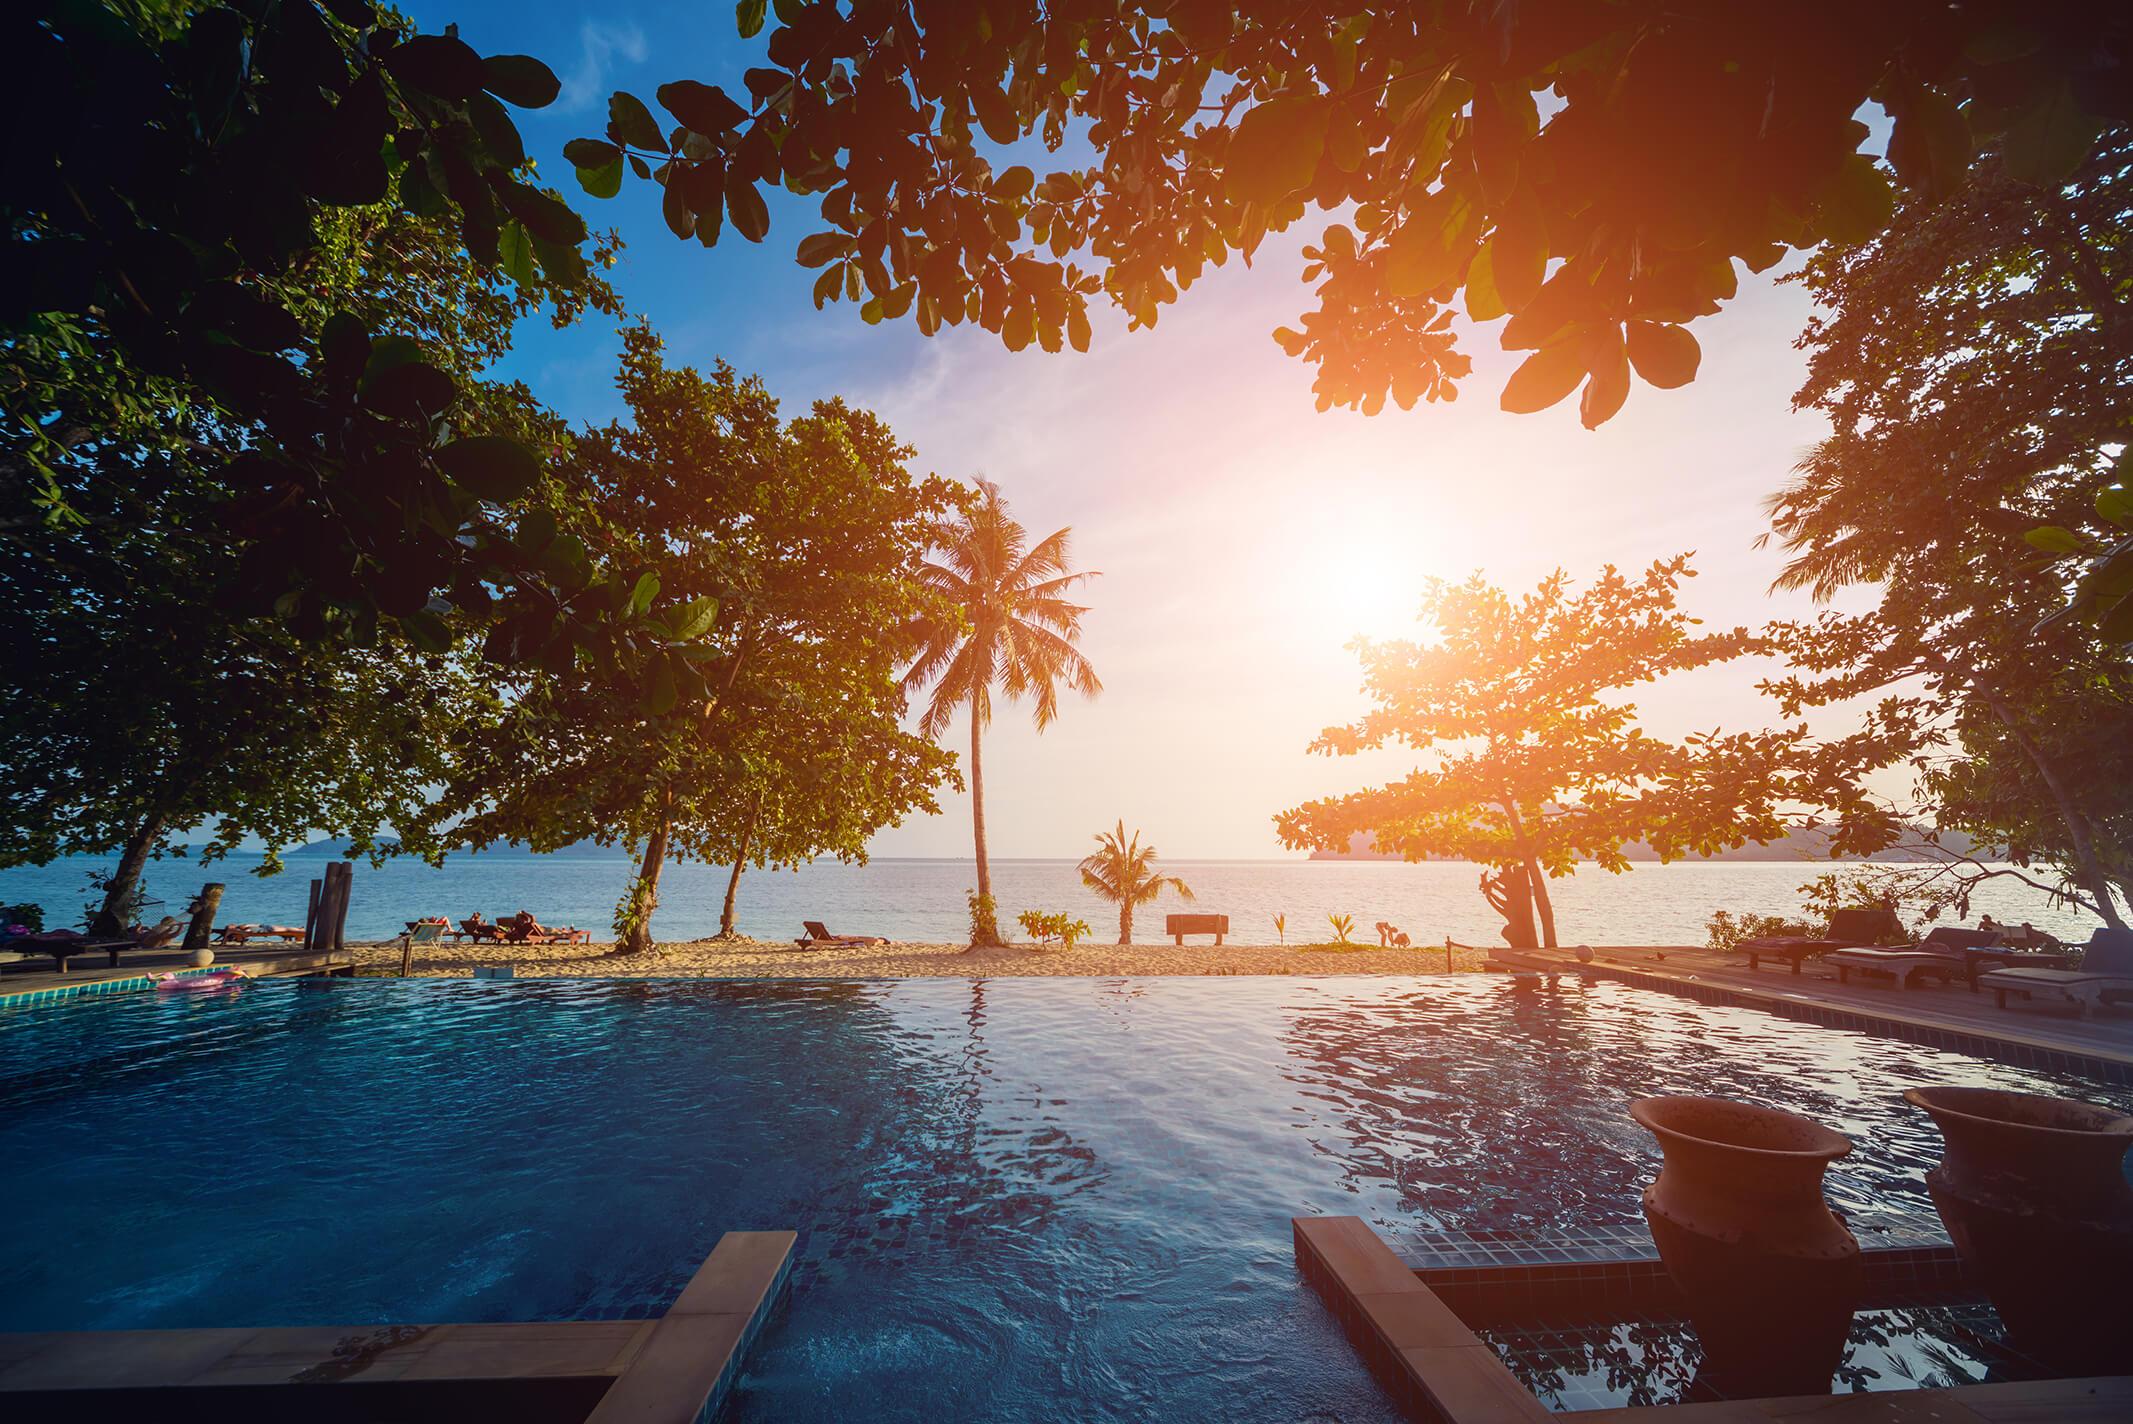 swimming-pool-exotic-tropical-resort-exotic-garden (1).jpg